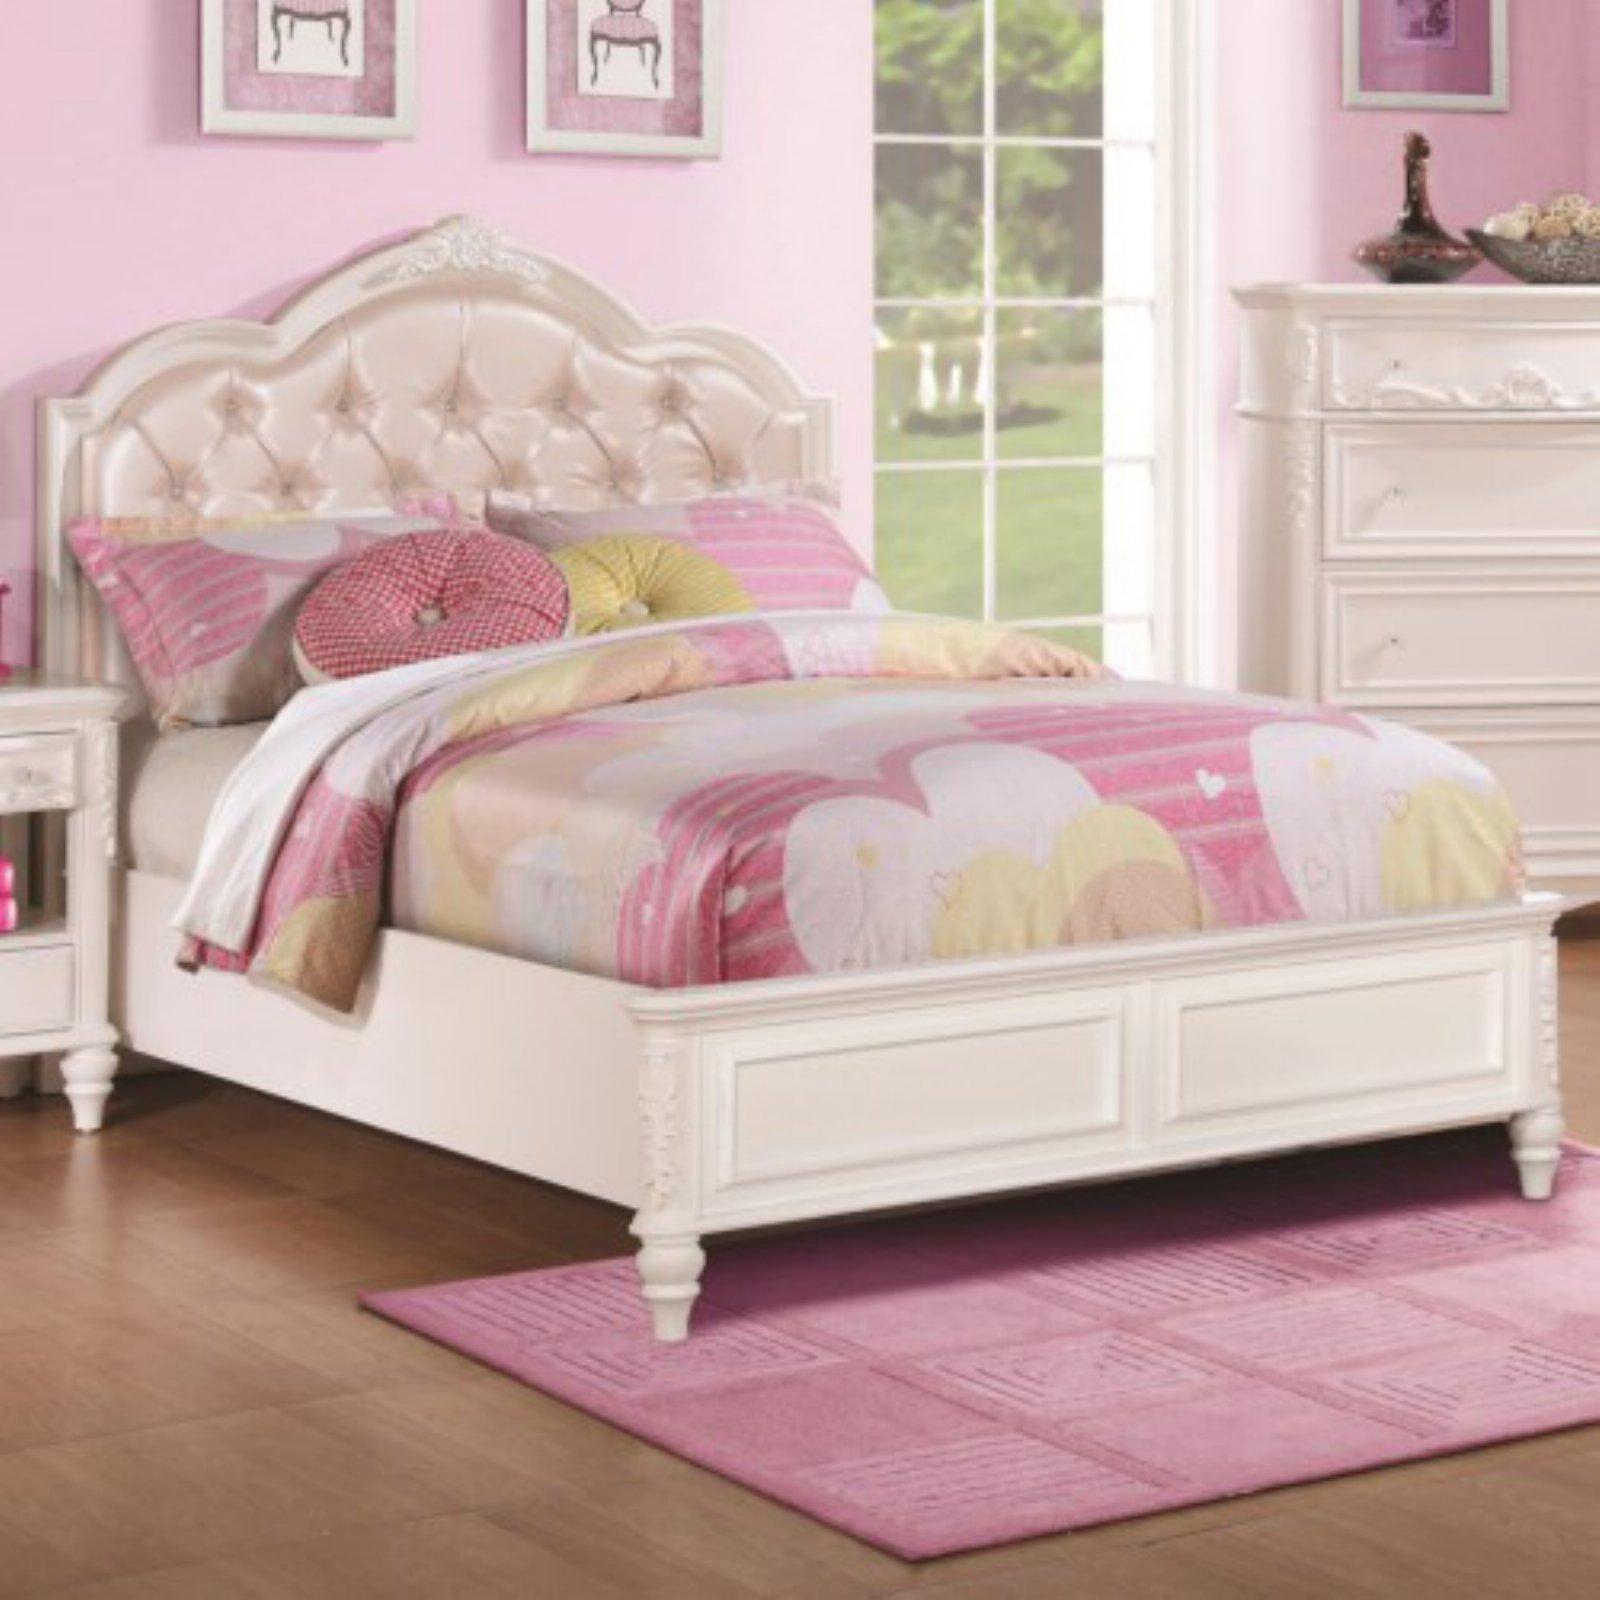 Coaster Furniture Caroline Bed With Diamond Tufted Headboard